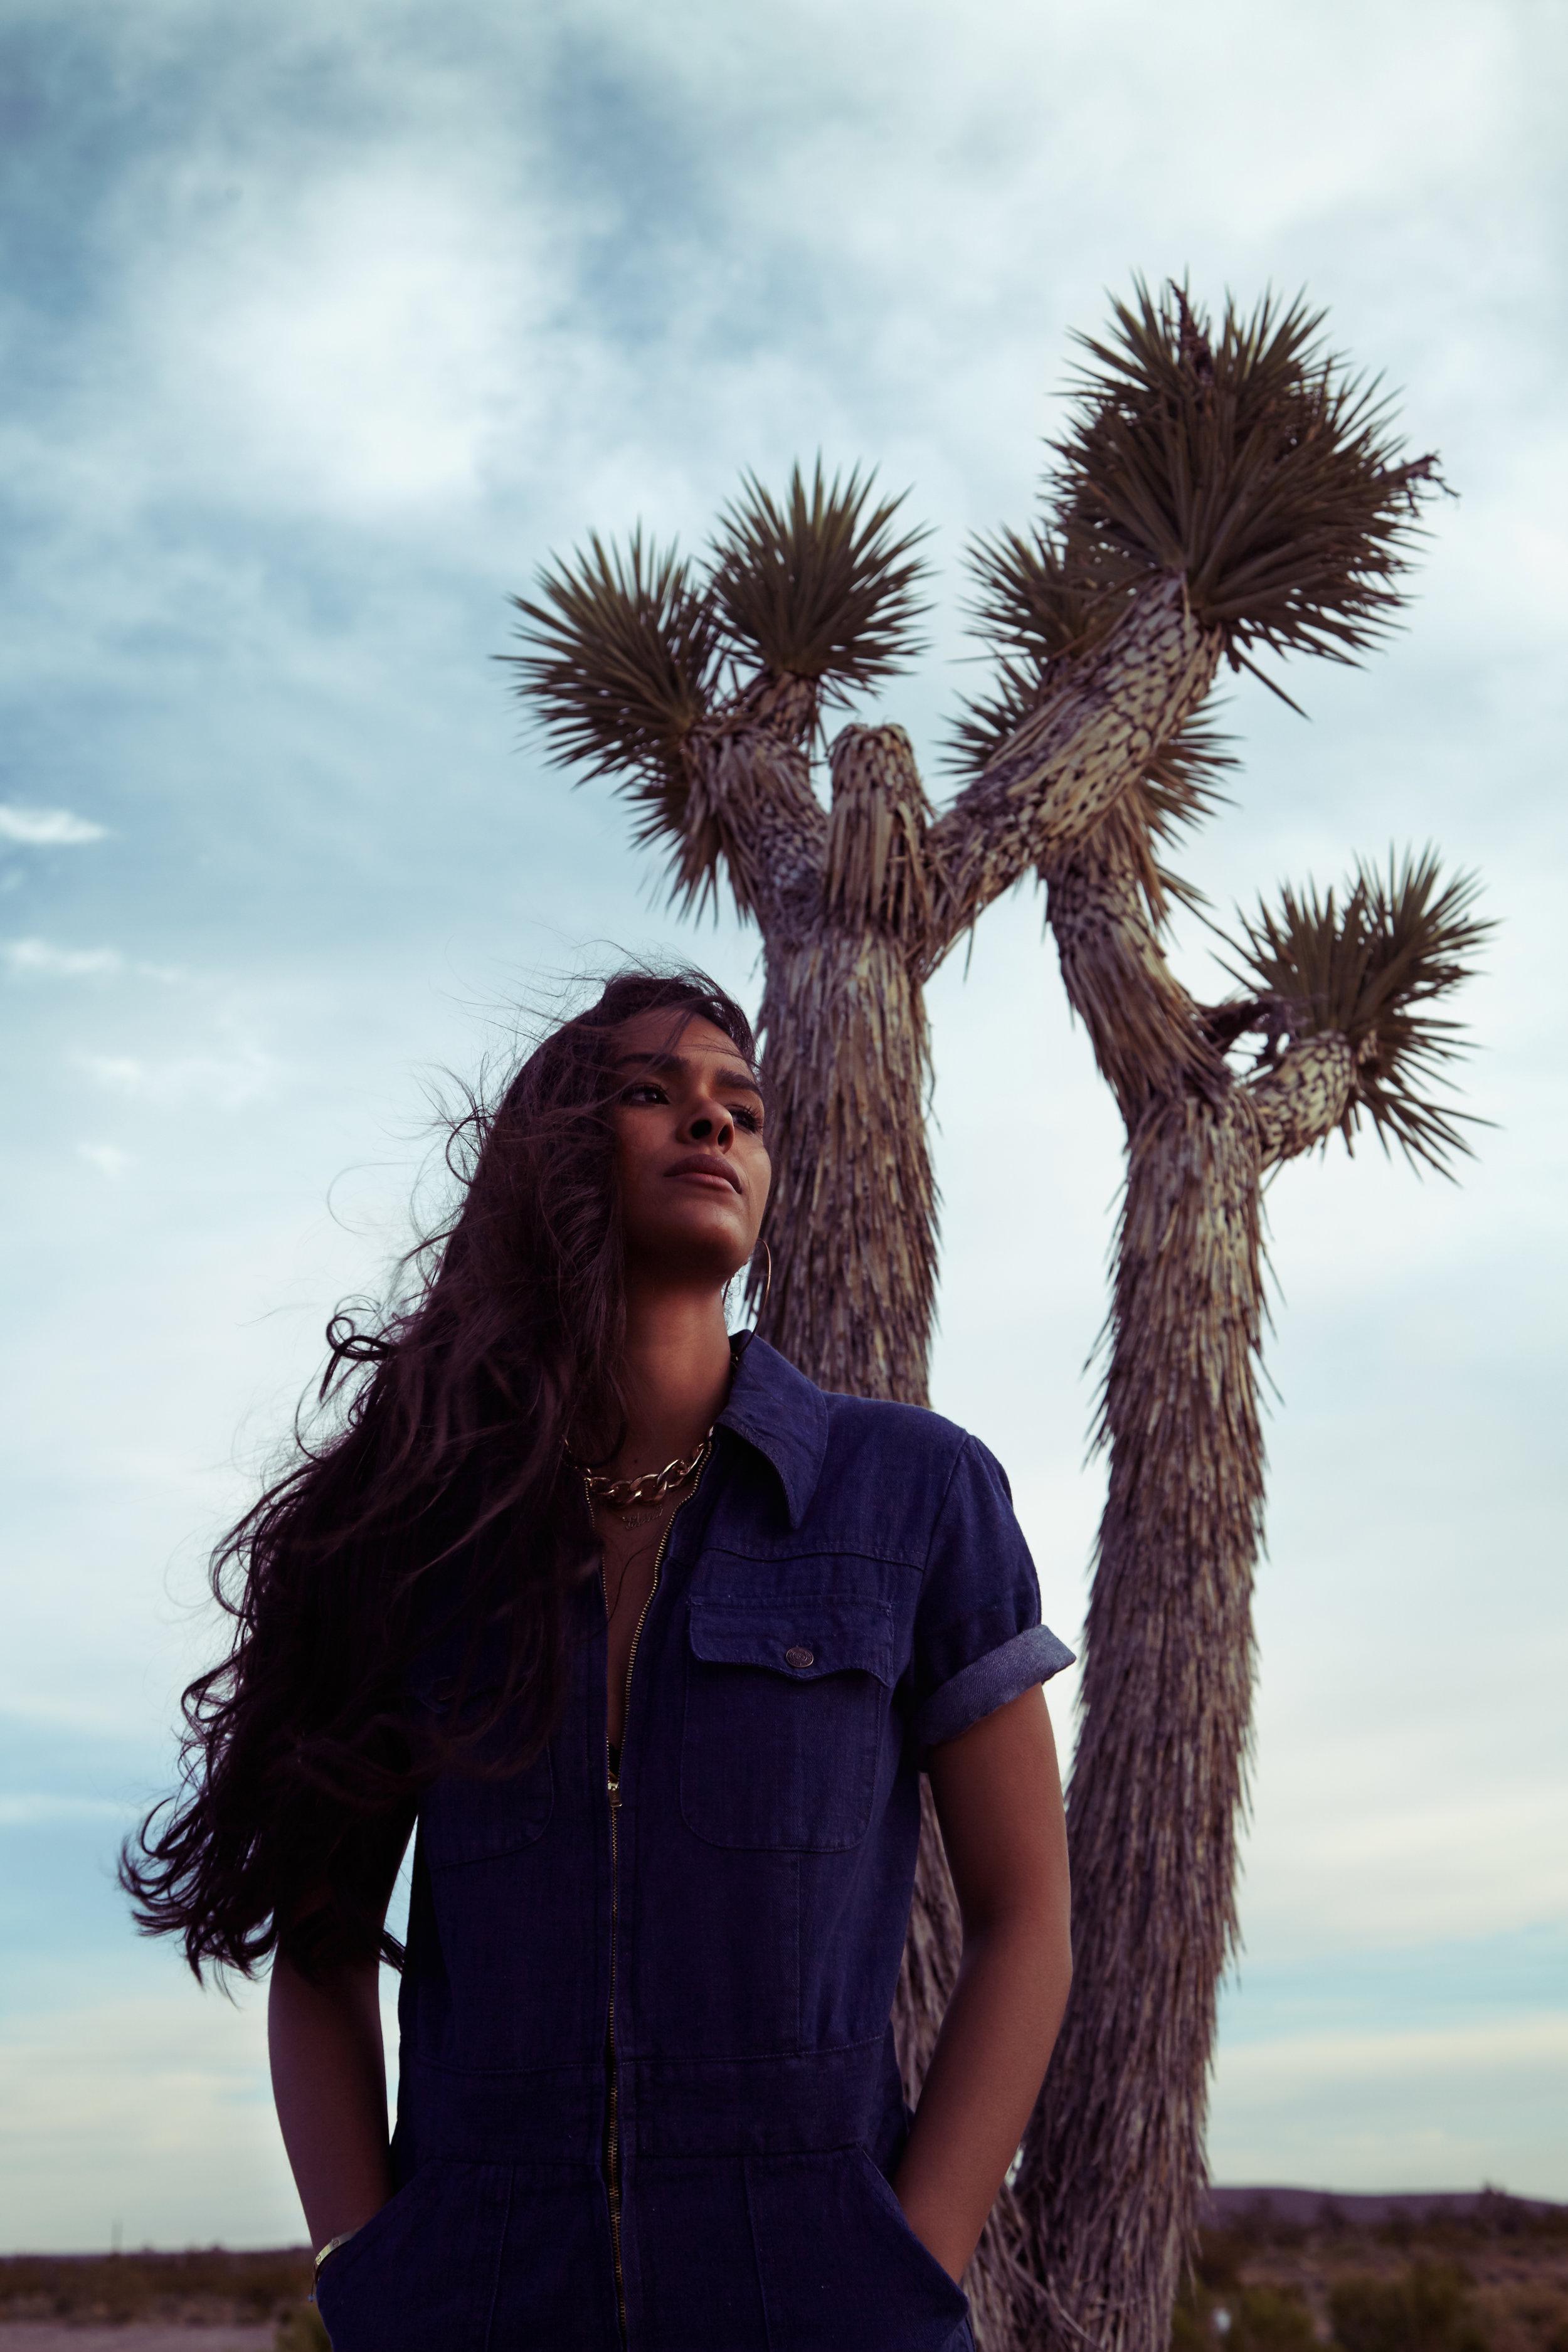 Elvira_Cal to Vegas_01_Remi Laudat_Final_v1.jpg